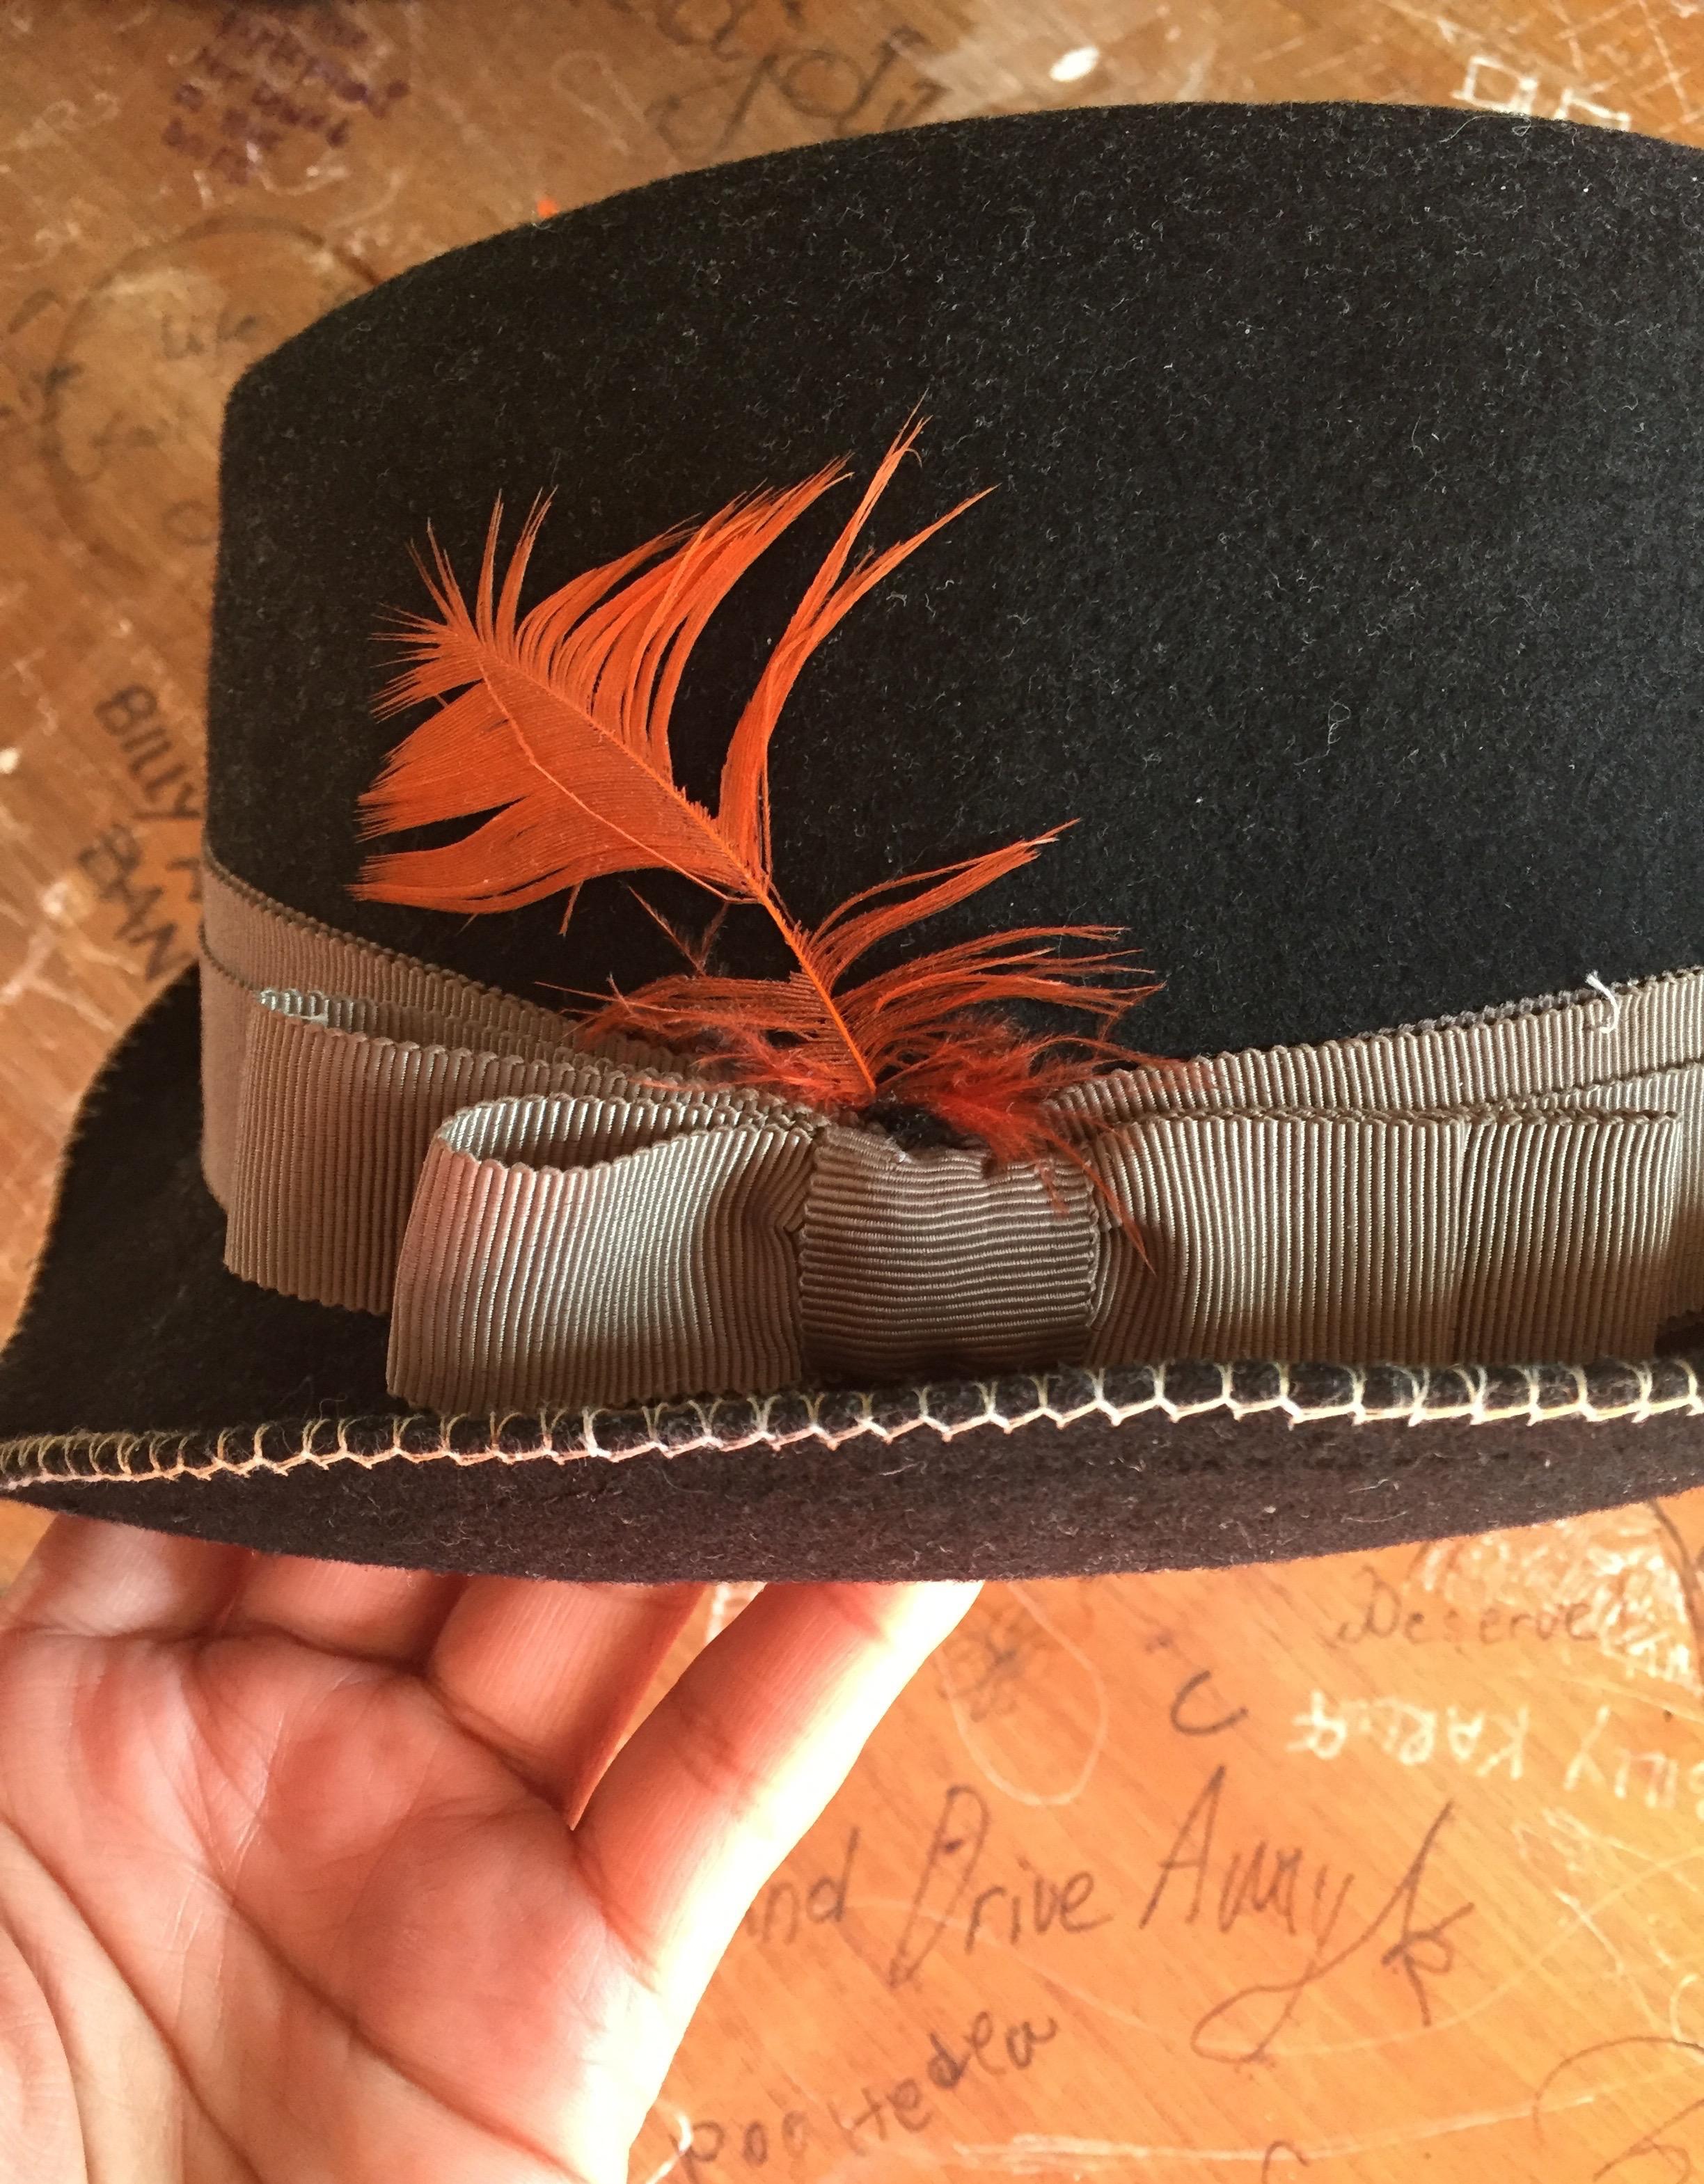 The original orange feather remains.